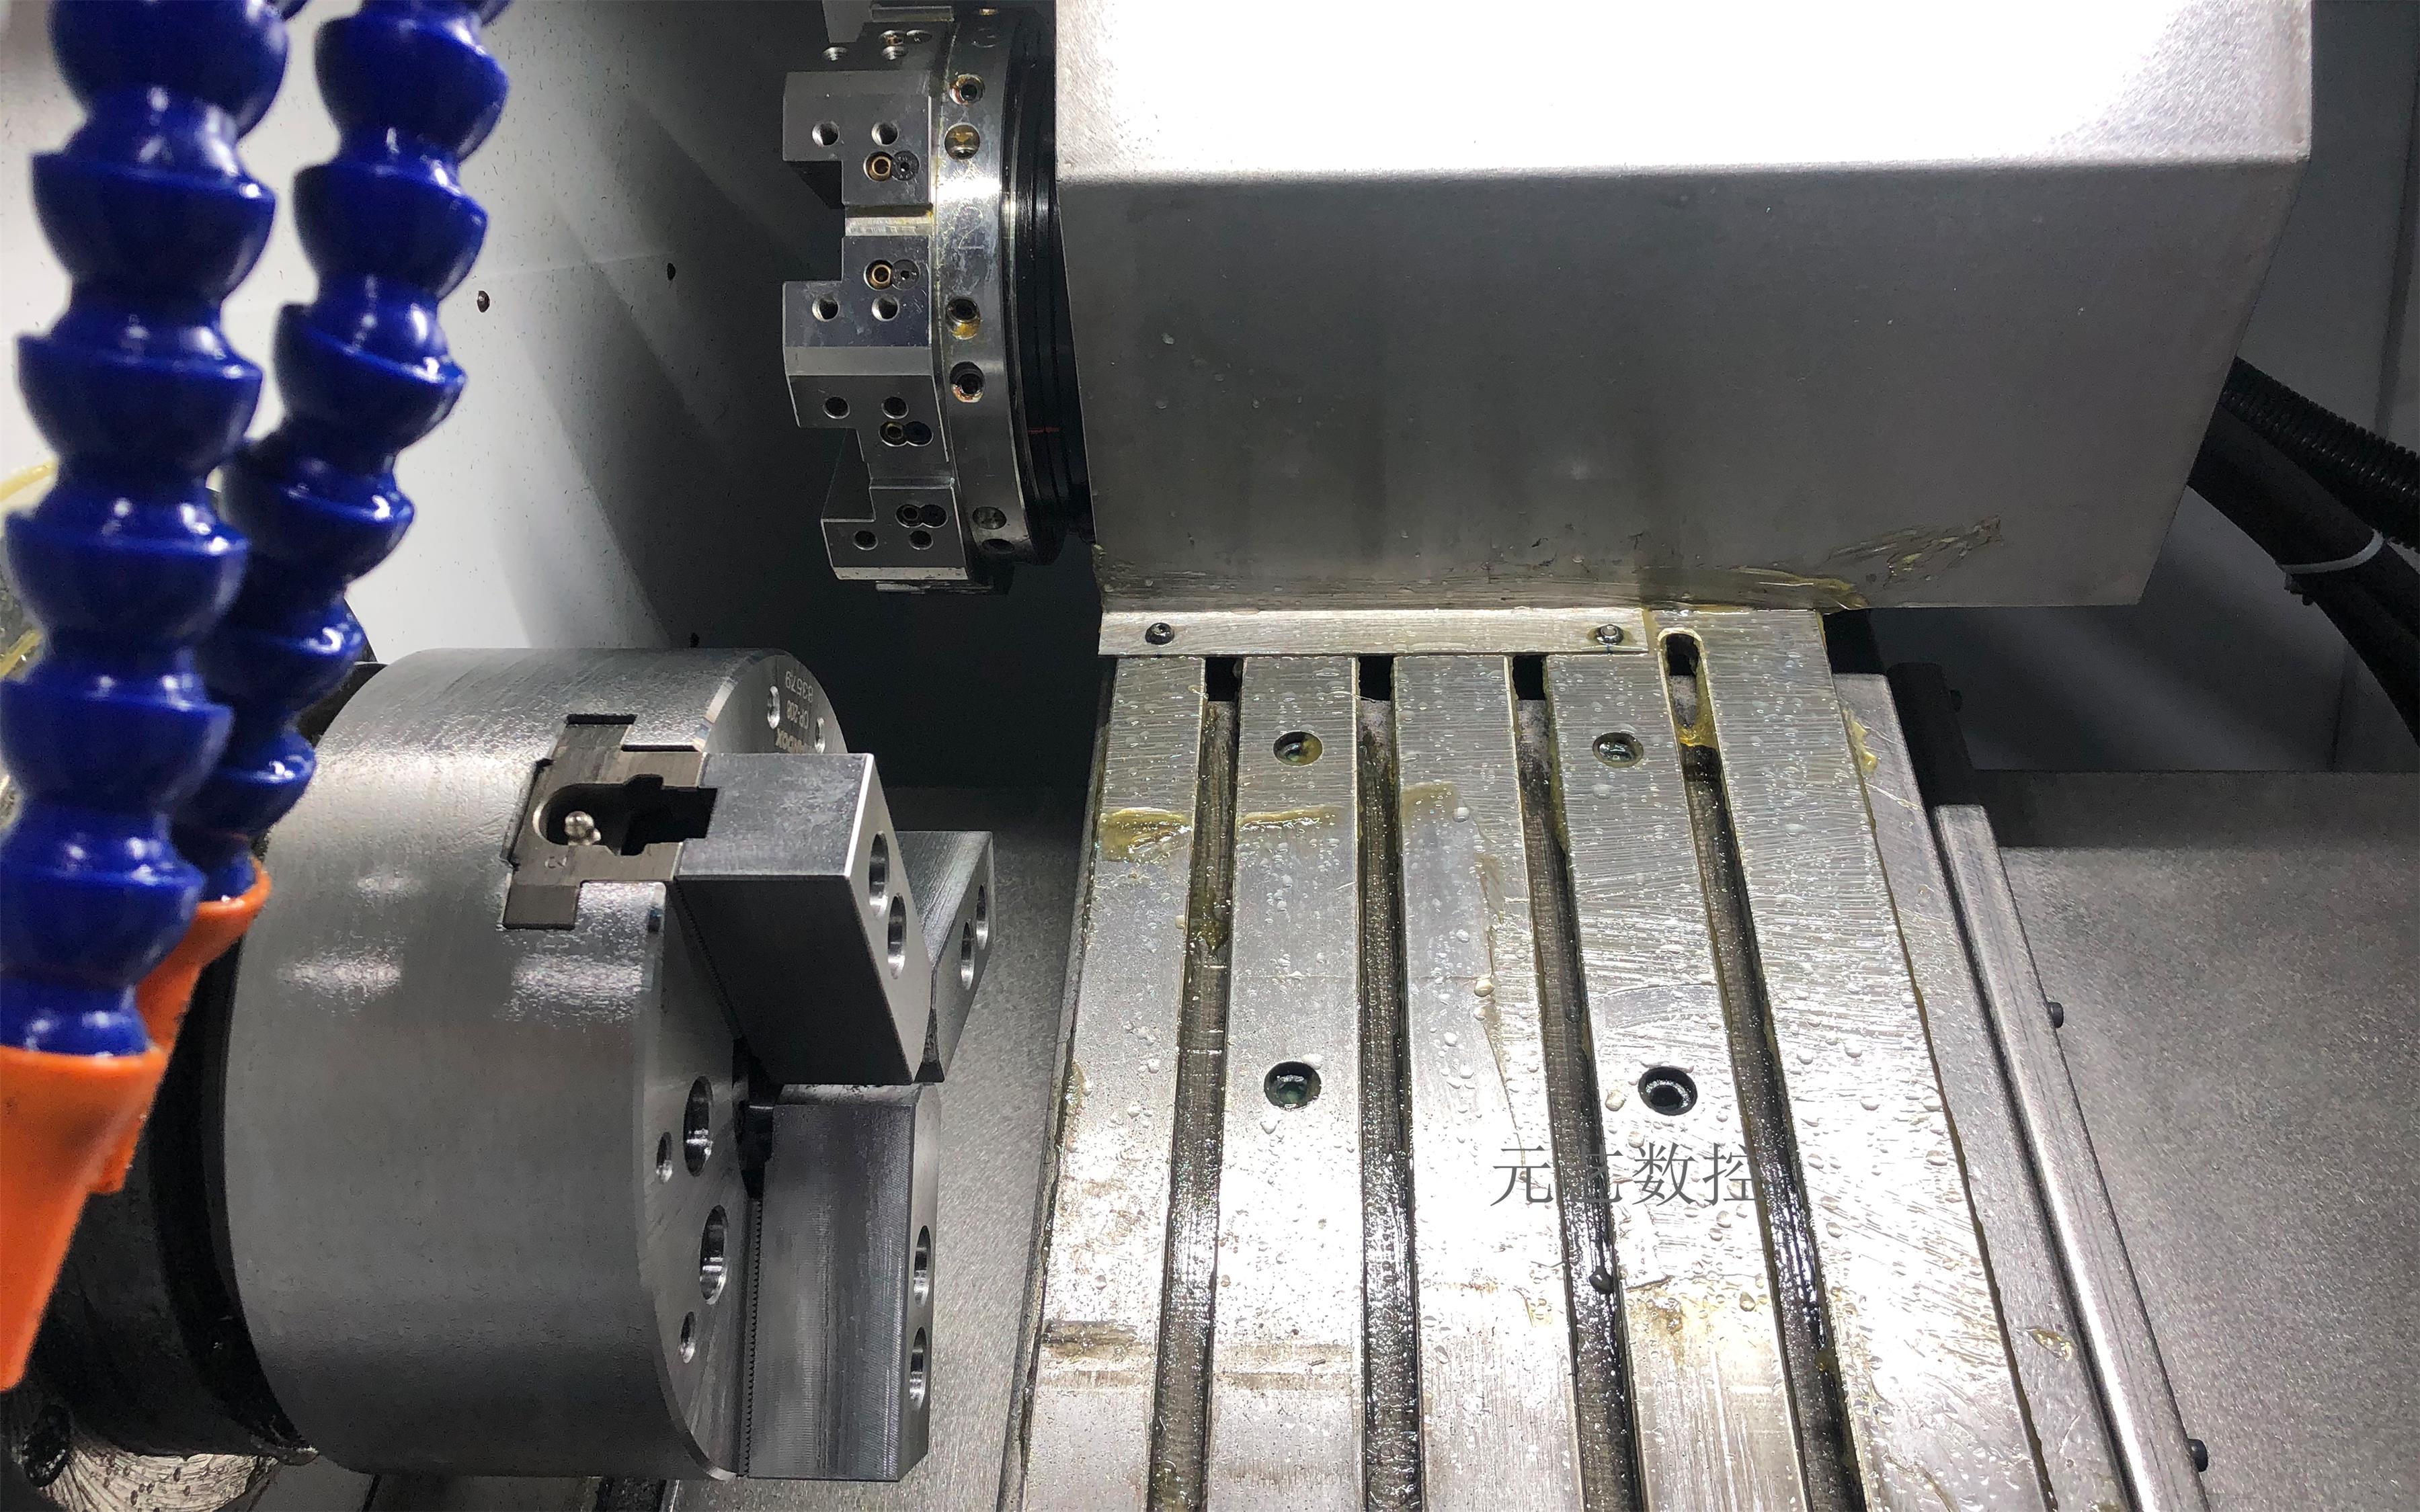 CK46X/D 刀塔斜轨精密数控车床(不带尾顶)